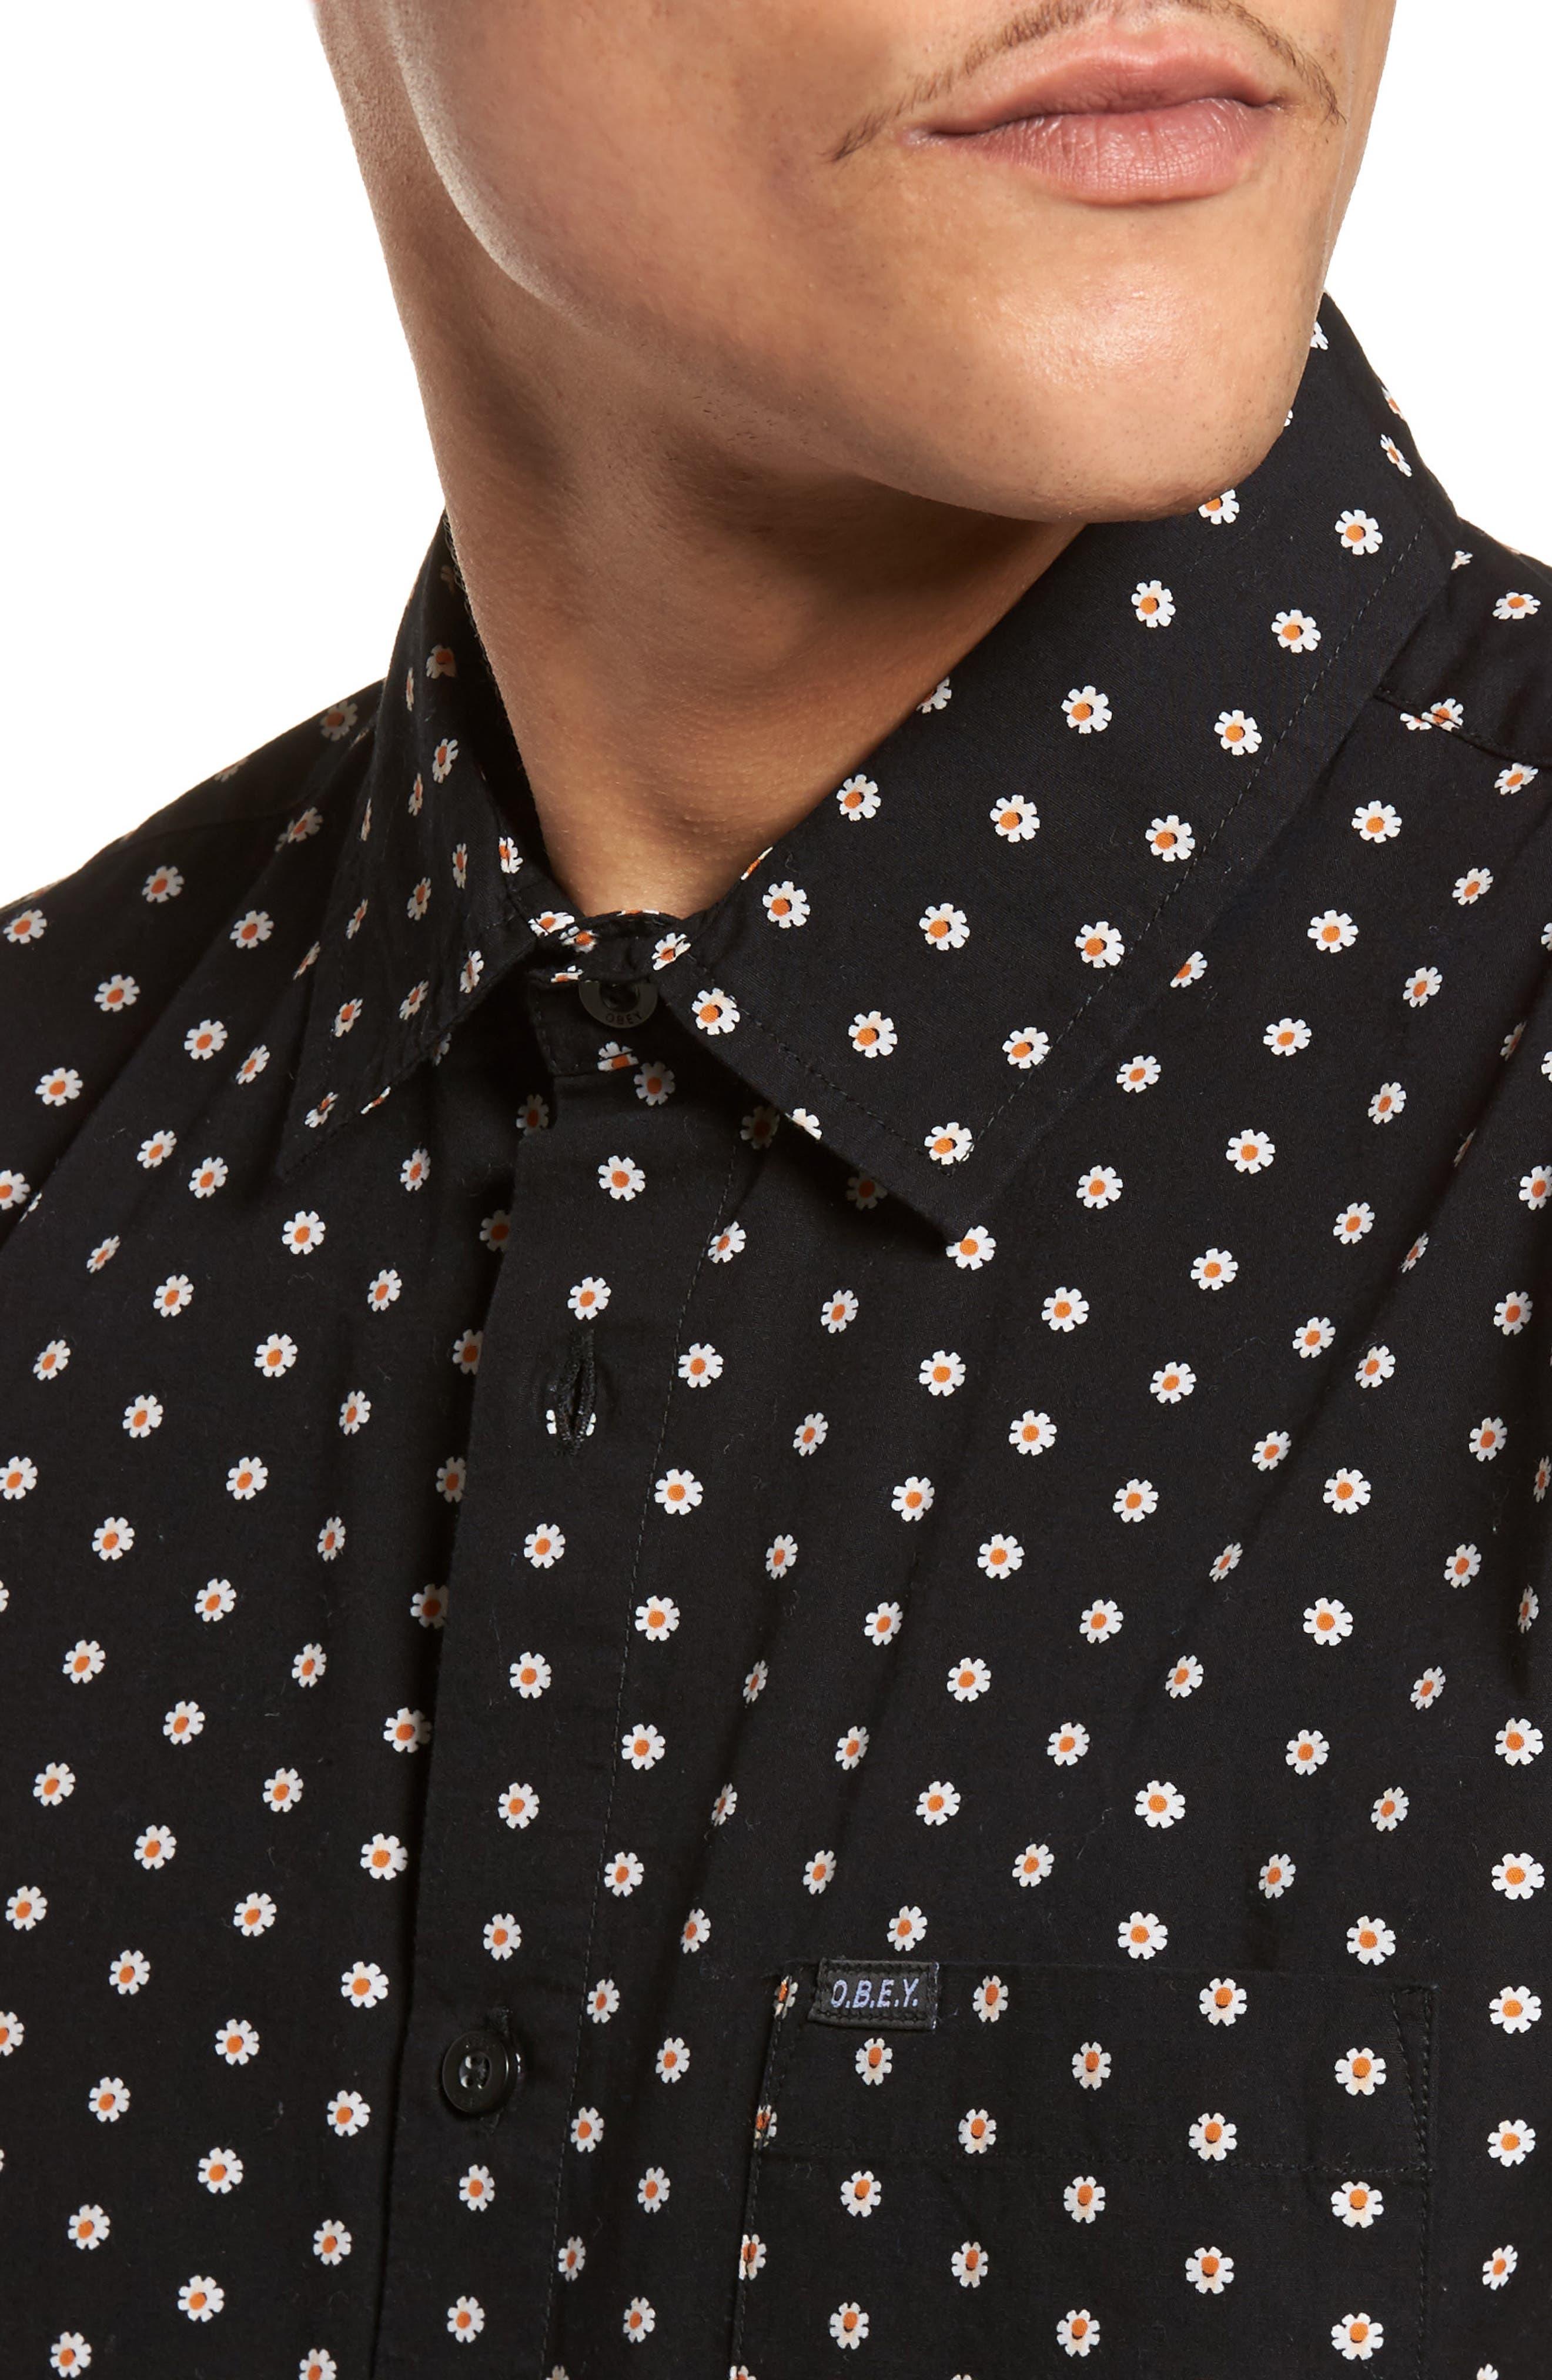 Brighton Short Sleeve Shirt,                             Alternate thumbnail 4, color,                             002